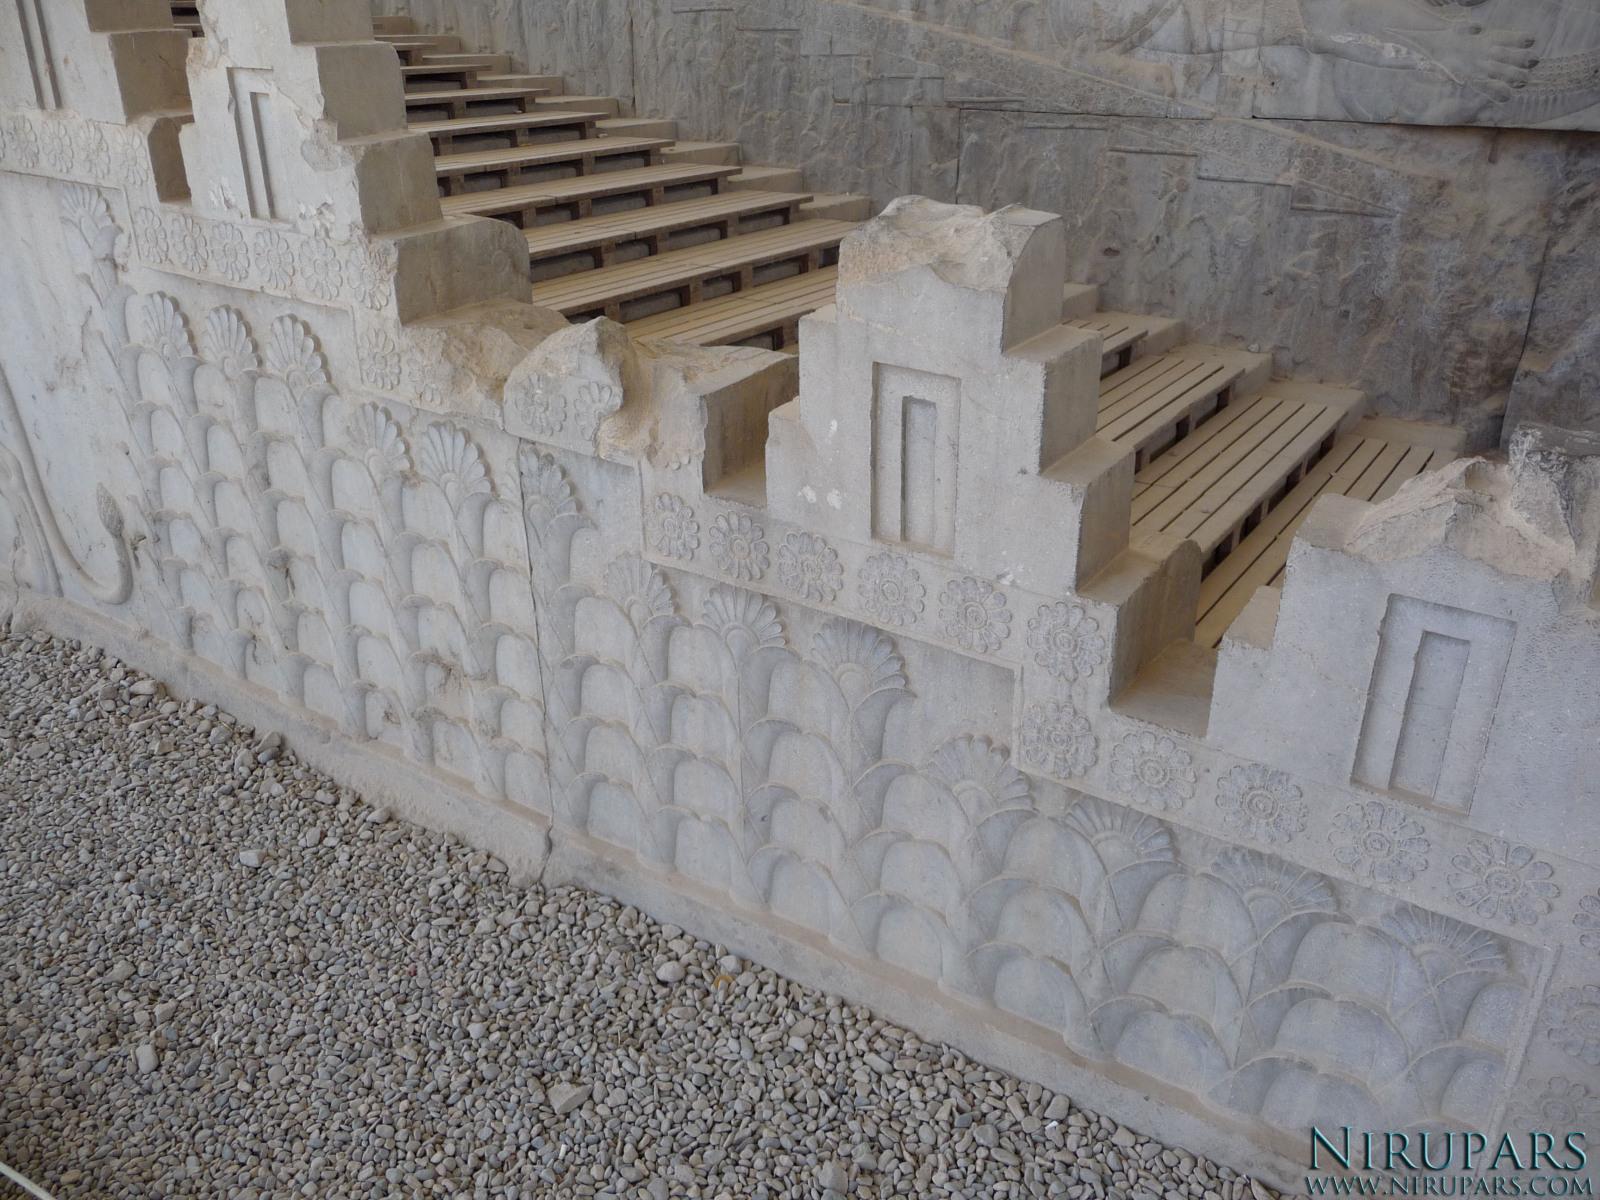 Persepolis - Council Hall Tripylon - North Portico - Relief Lotus Blossom